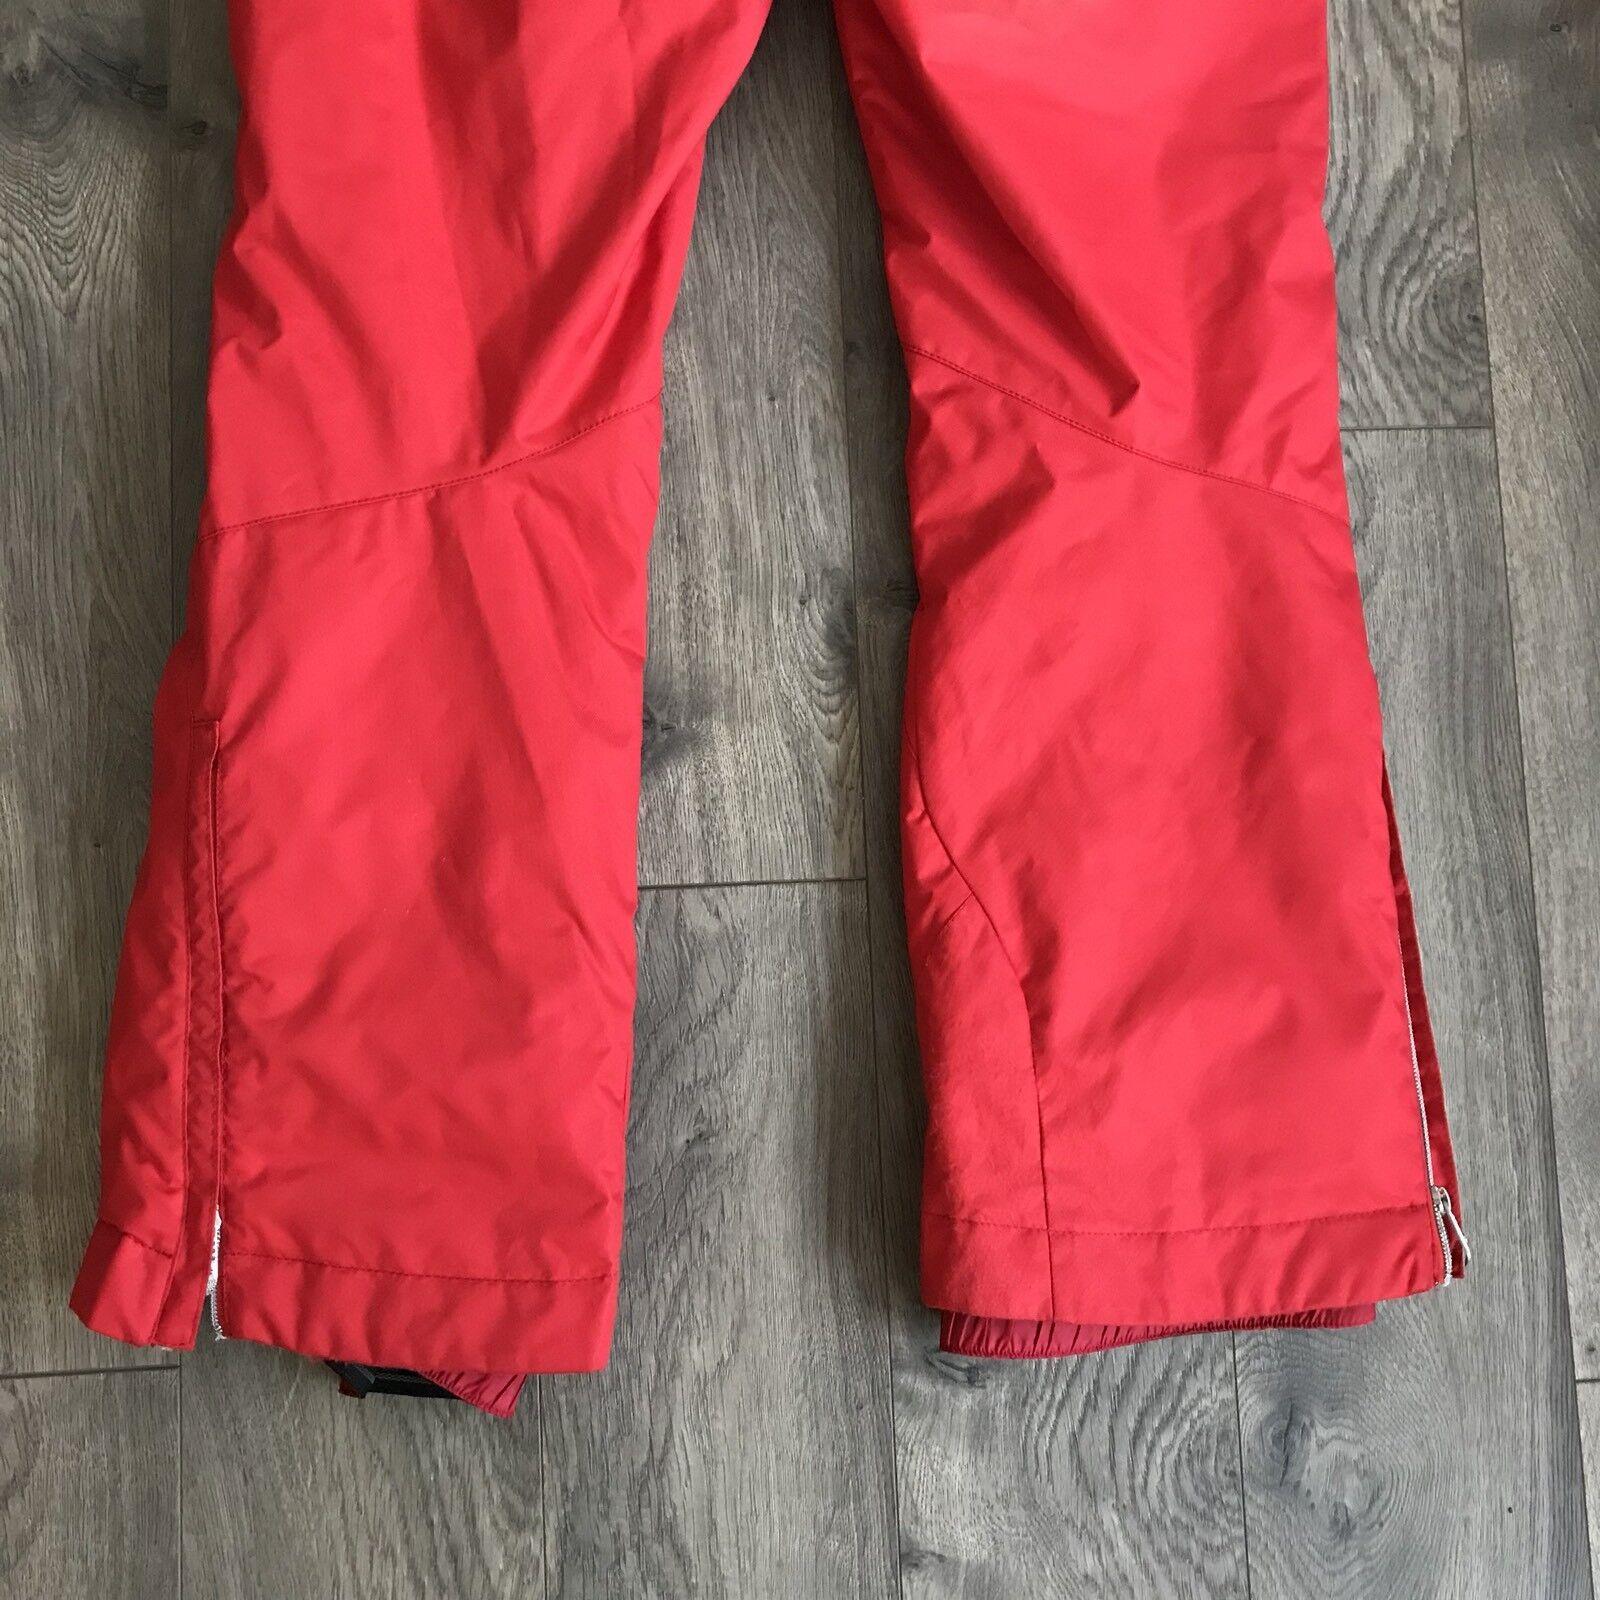 GOLDWIN G-8352EL SKI Snowboard Race Racing Pants ROT Woman's Woman's Woman's Größe 10 7cae04